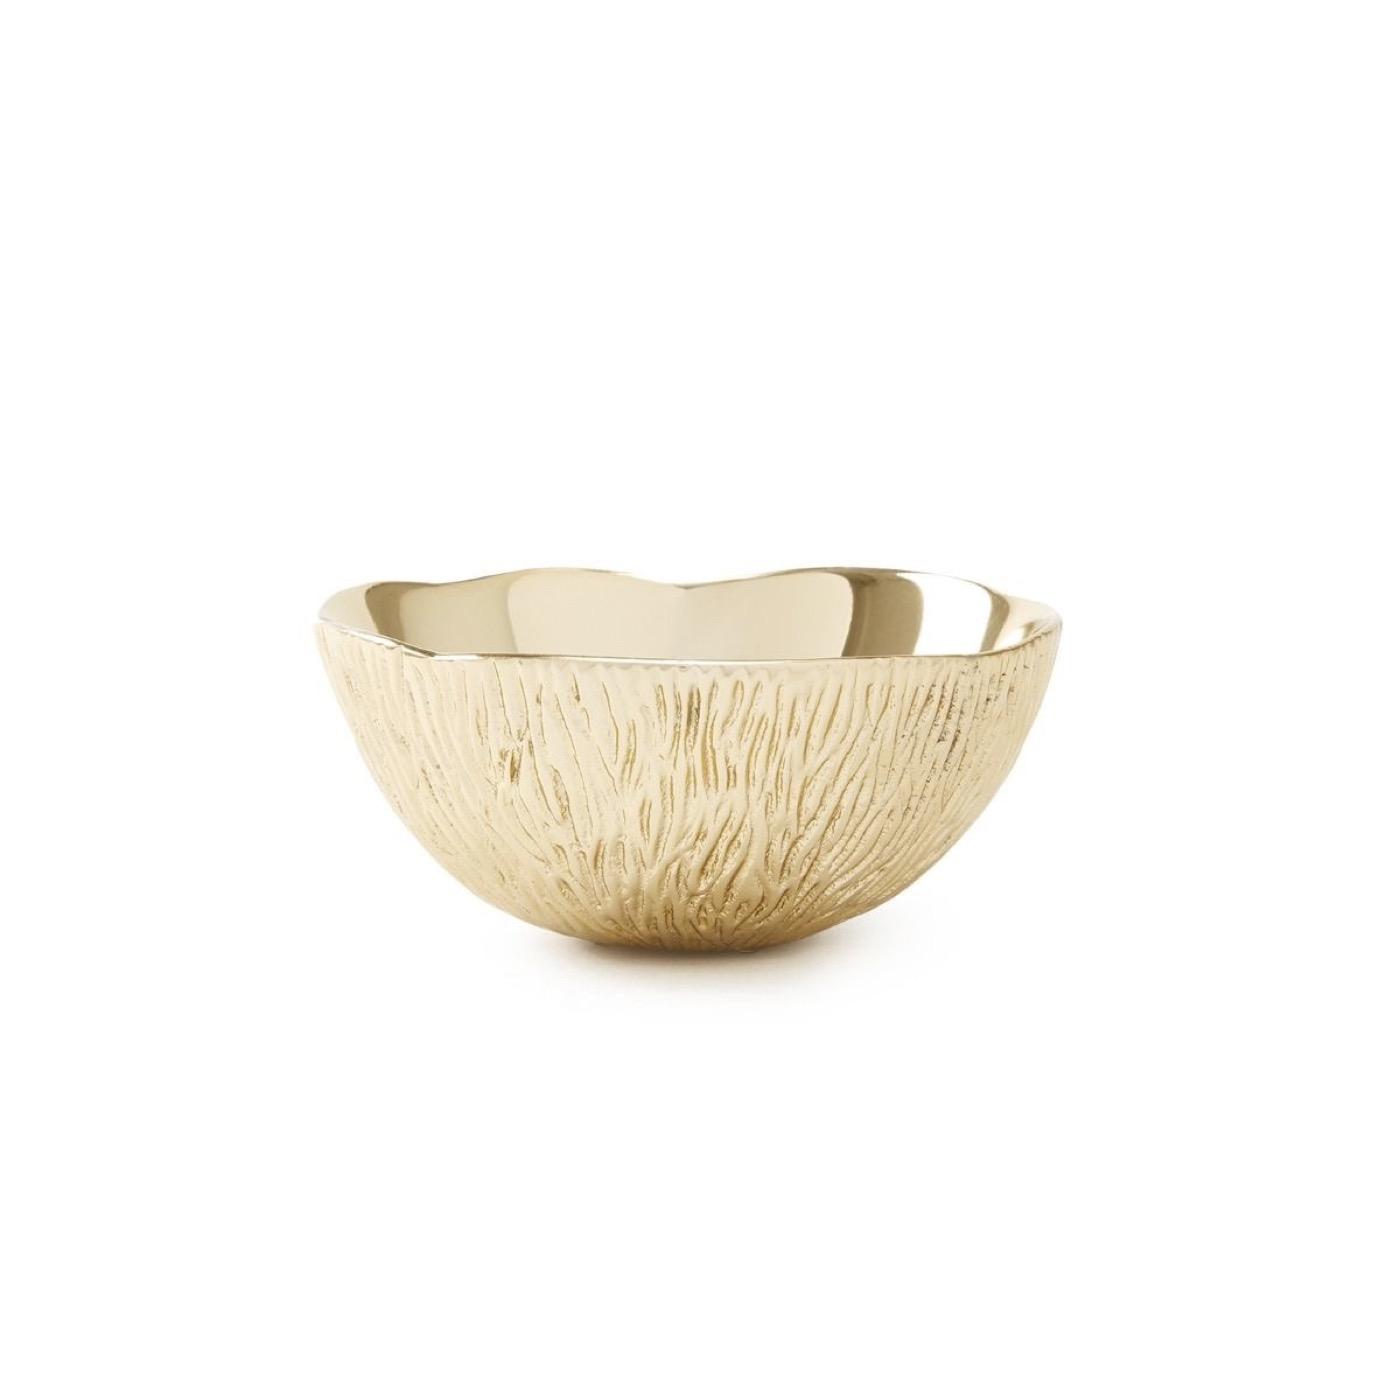 Marella Brass Bowls